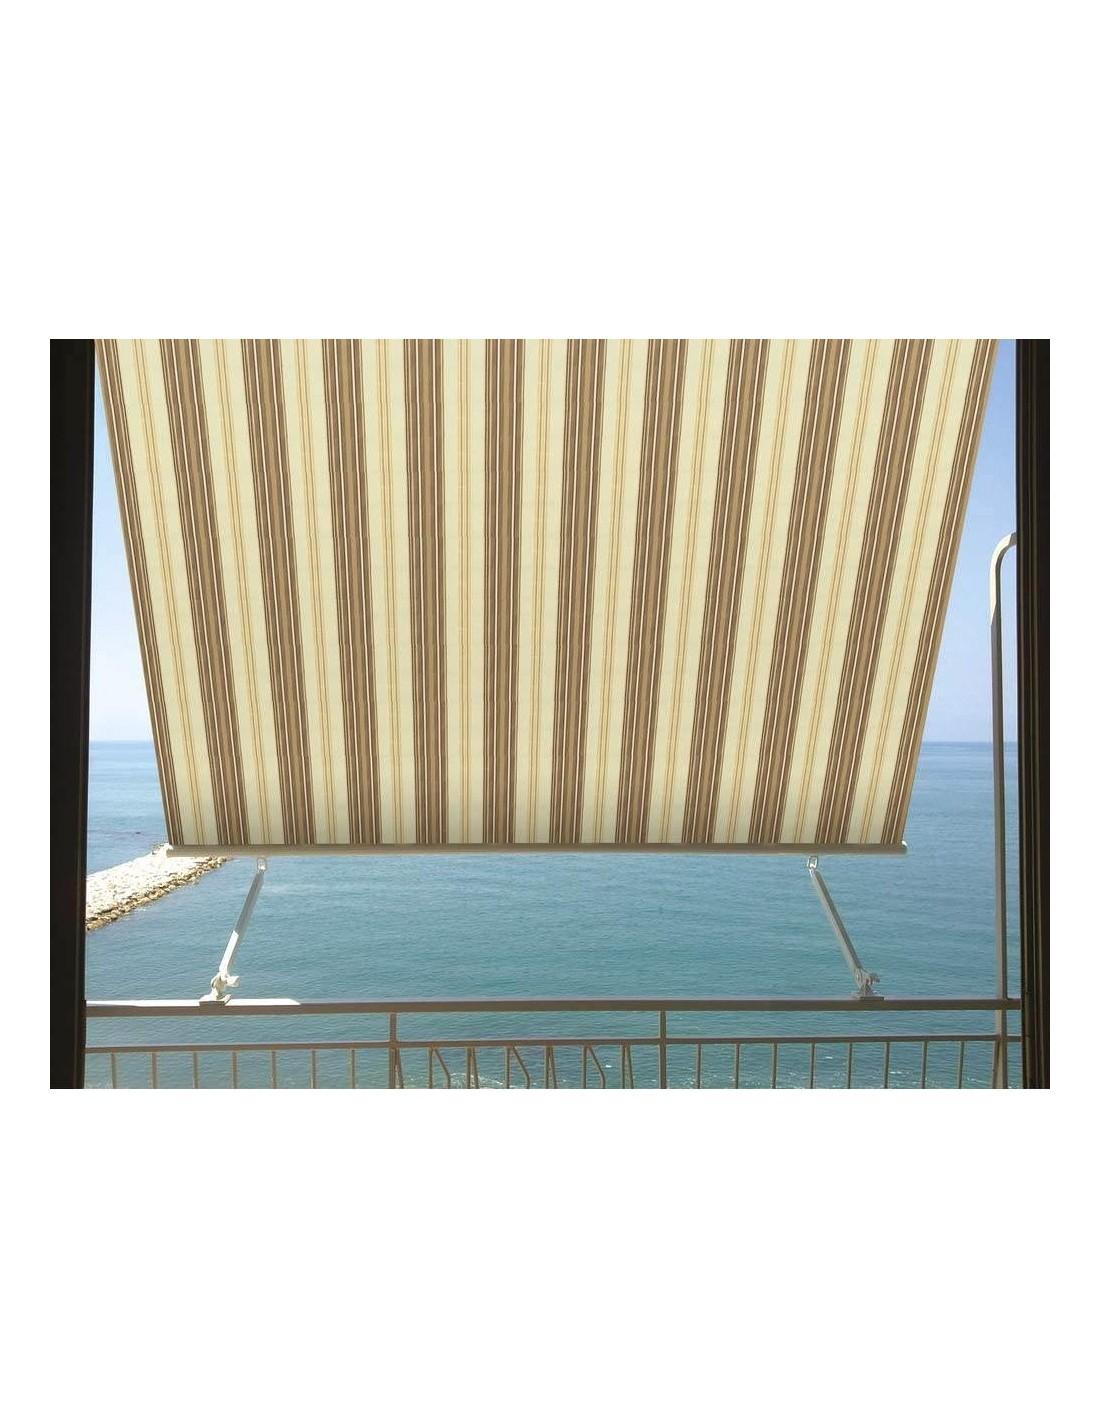 Tende Da Sole Frattamaggiore tenda da sole a caduta milos 3 x 2,45 mt beige e marrone a